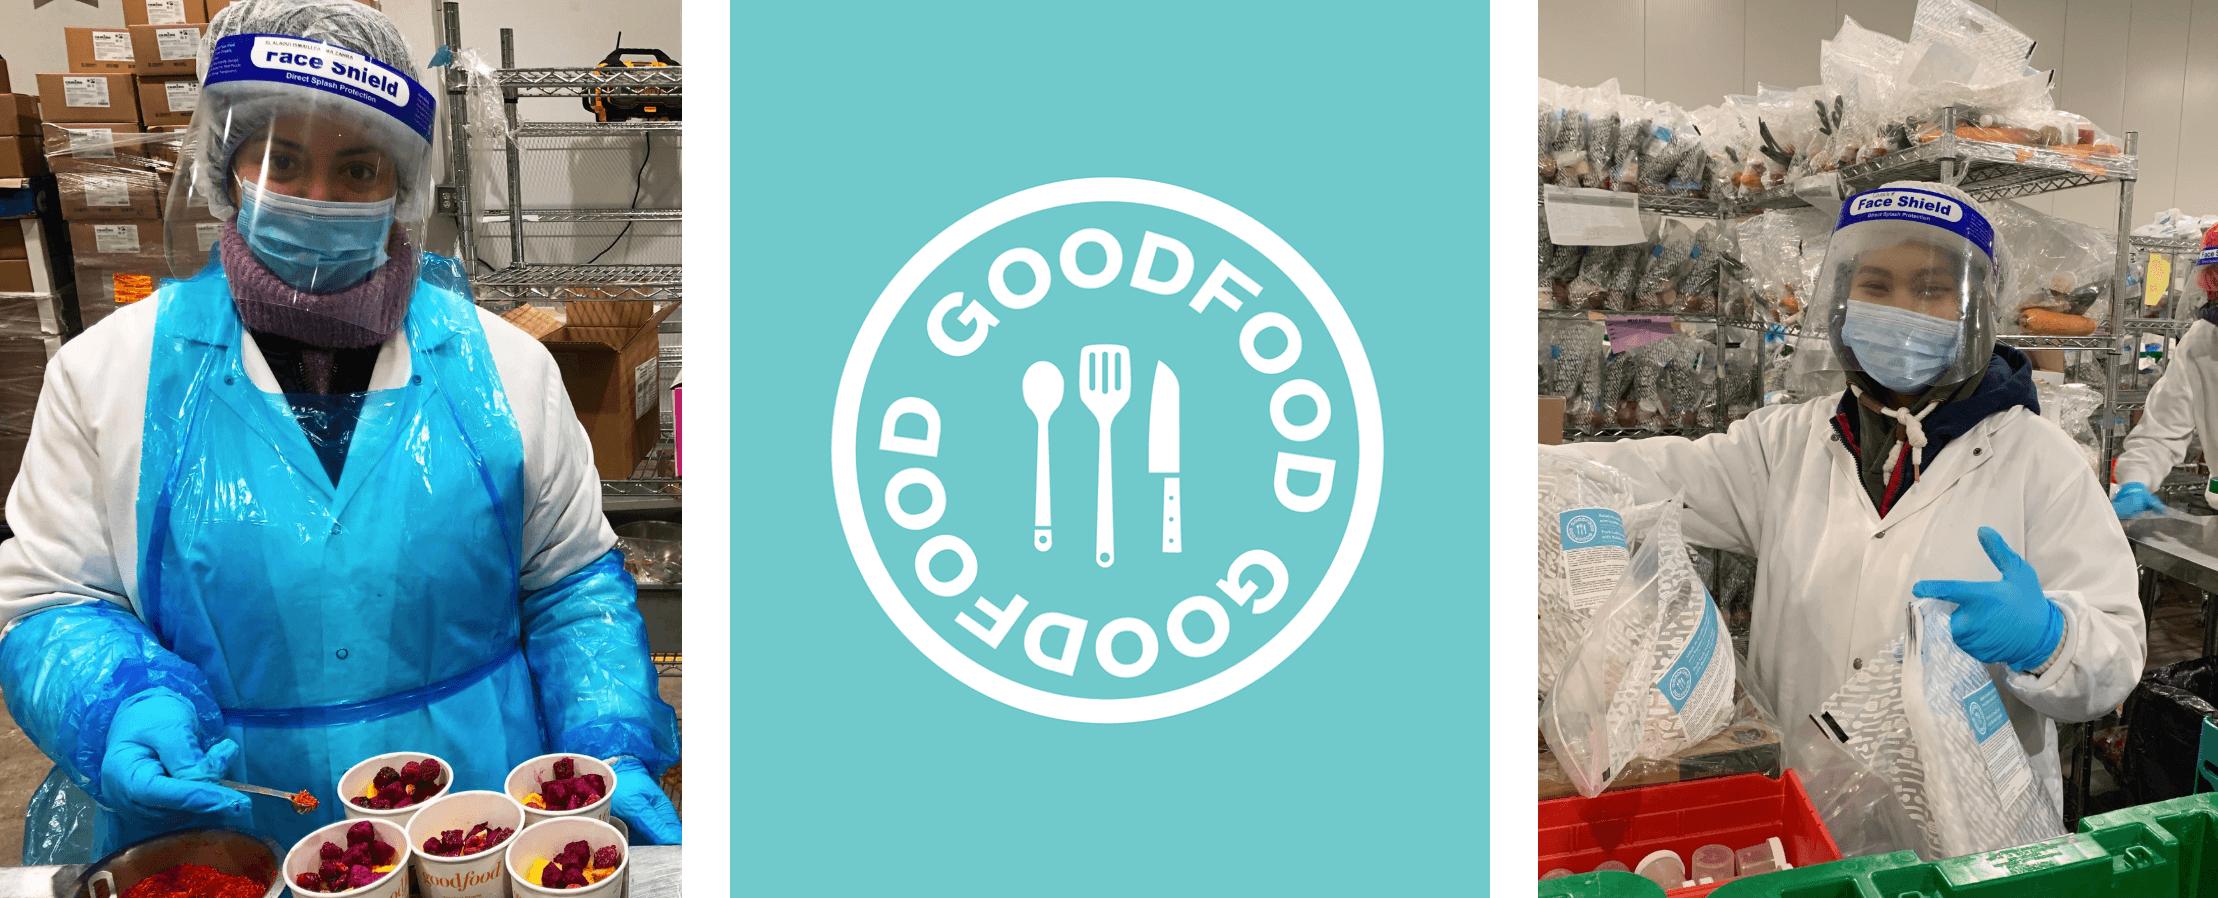 Goodfood production associates